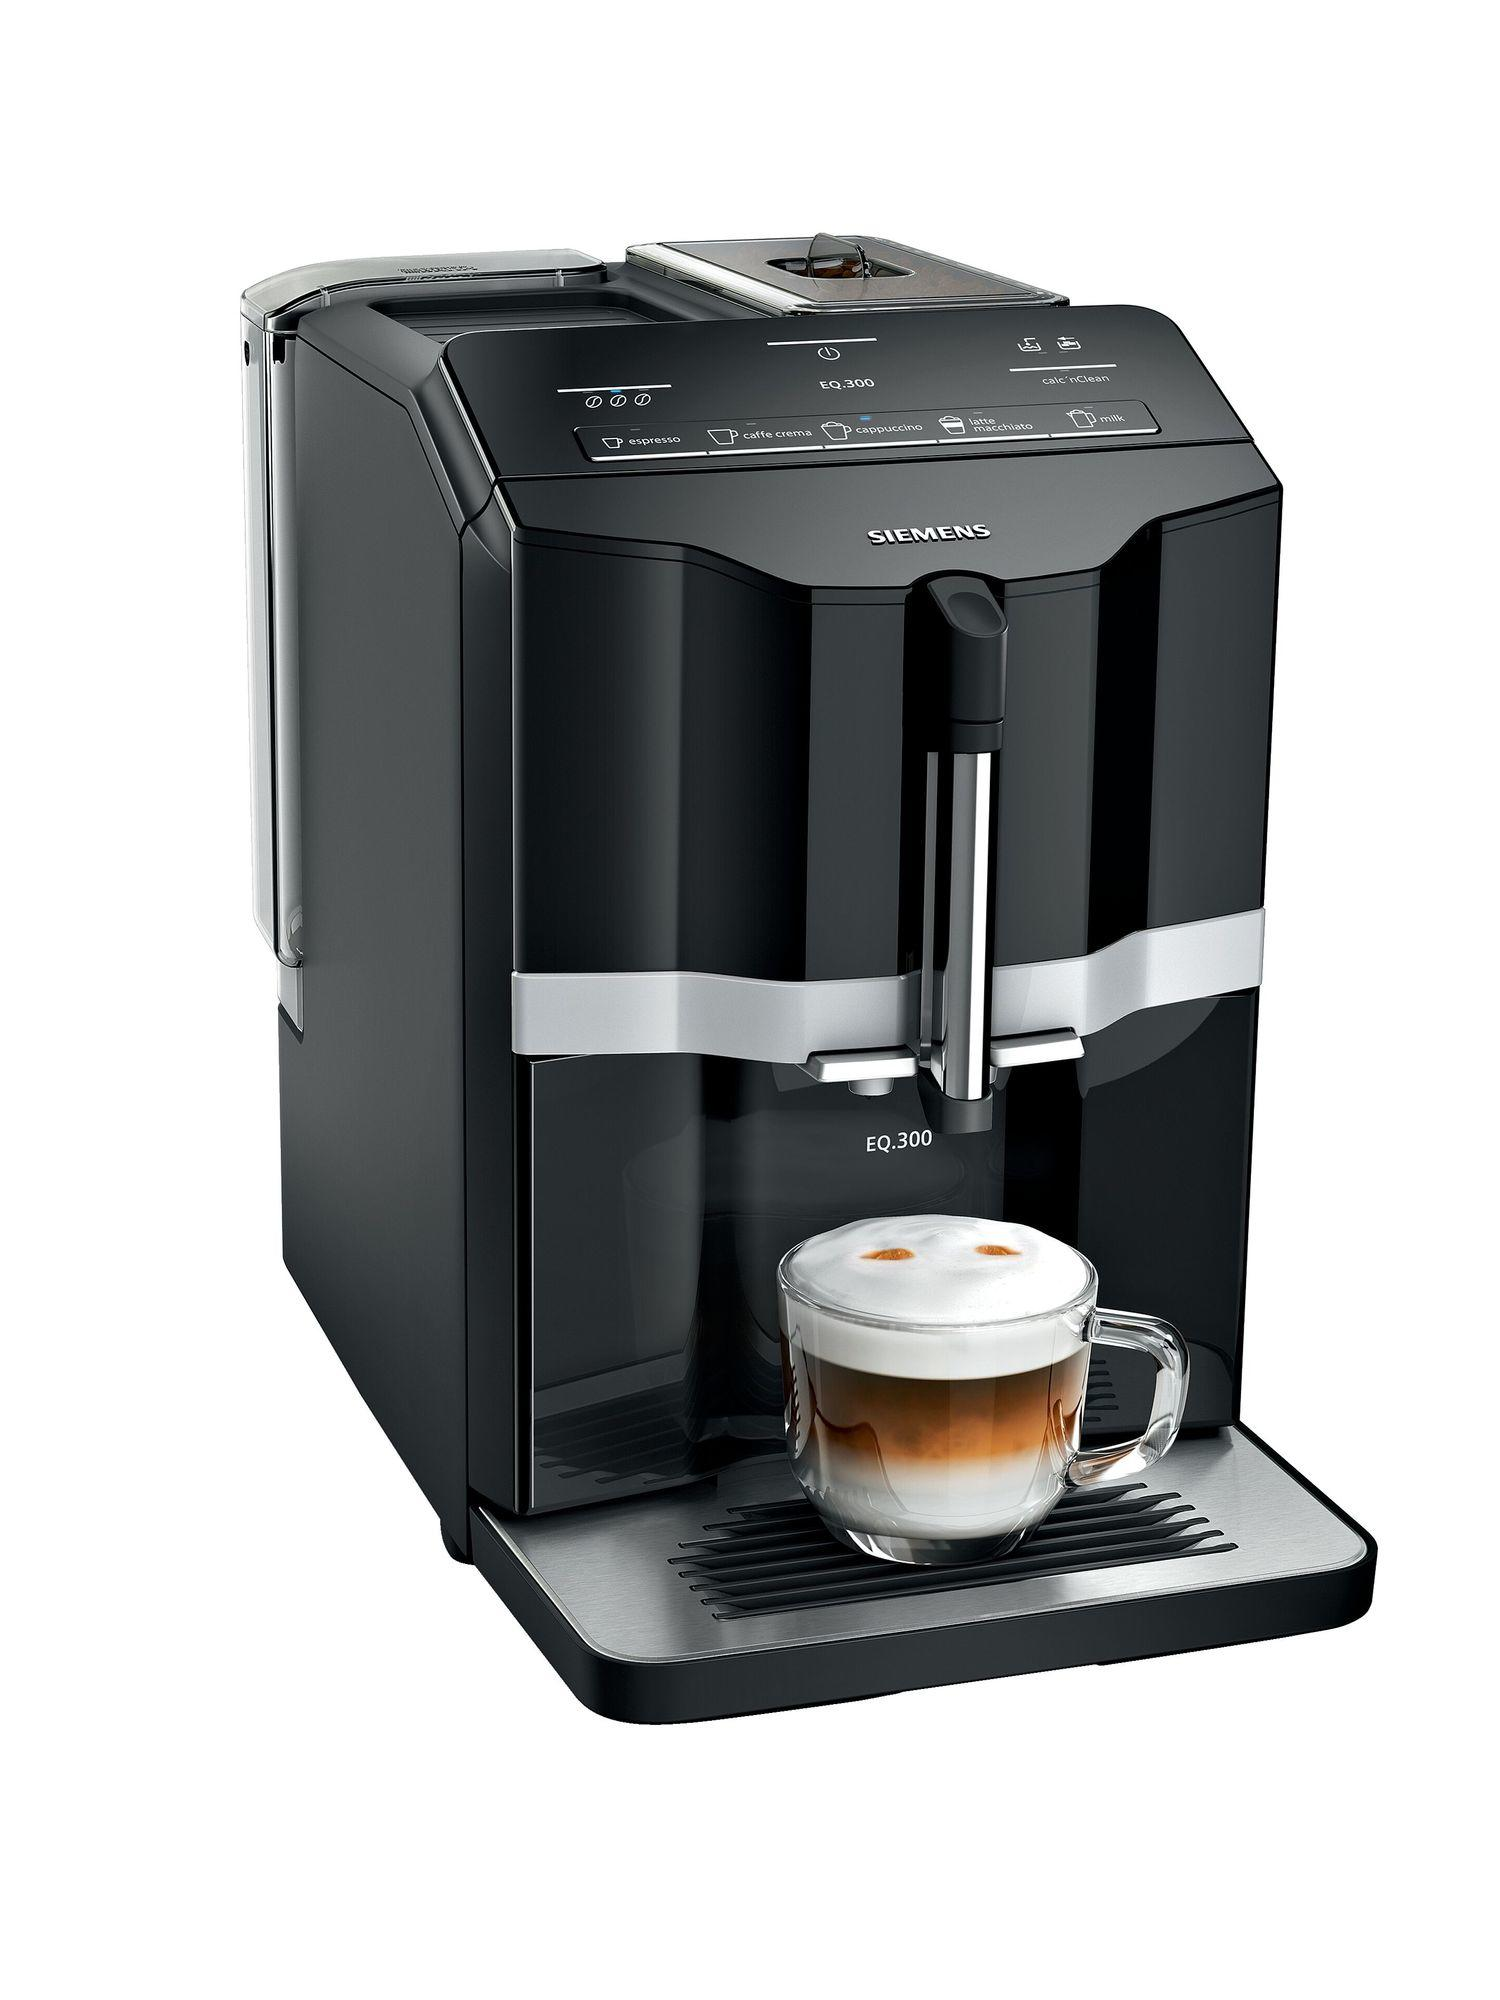 Image of TI351209GB EQ.3 Fully Automatic Coffee Machine